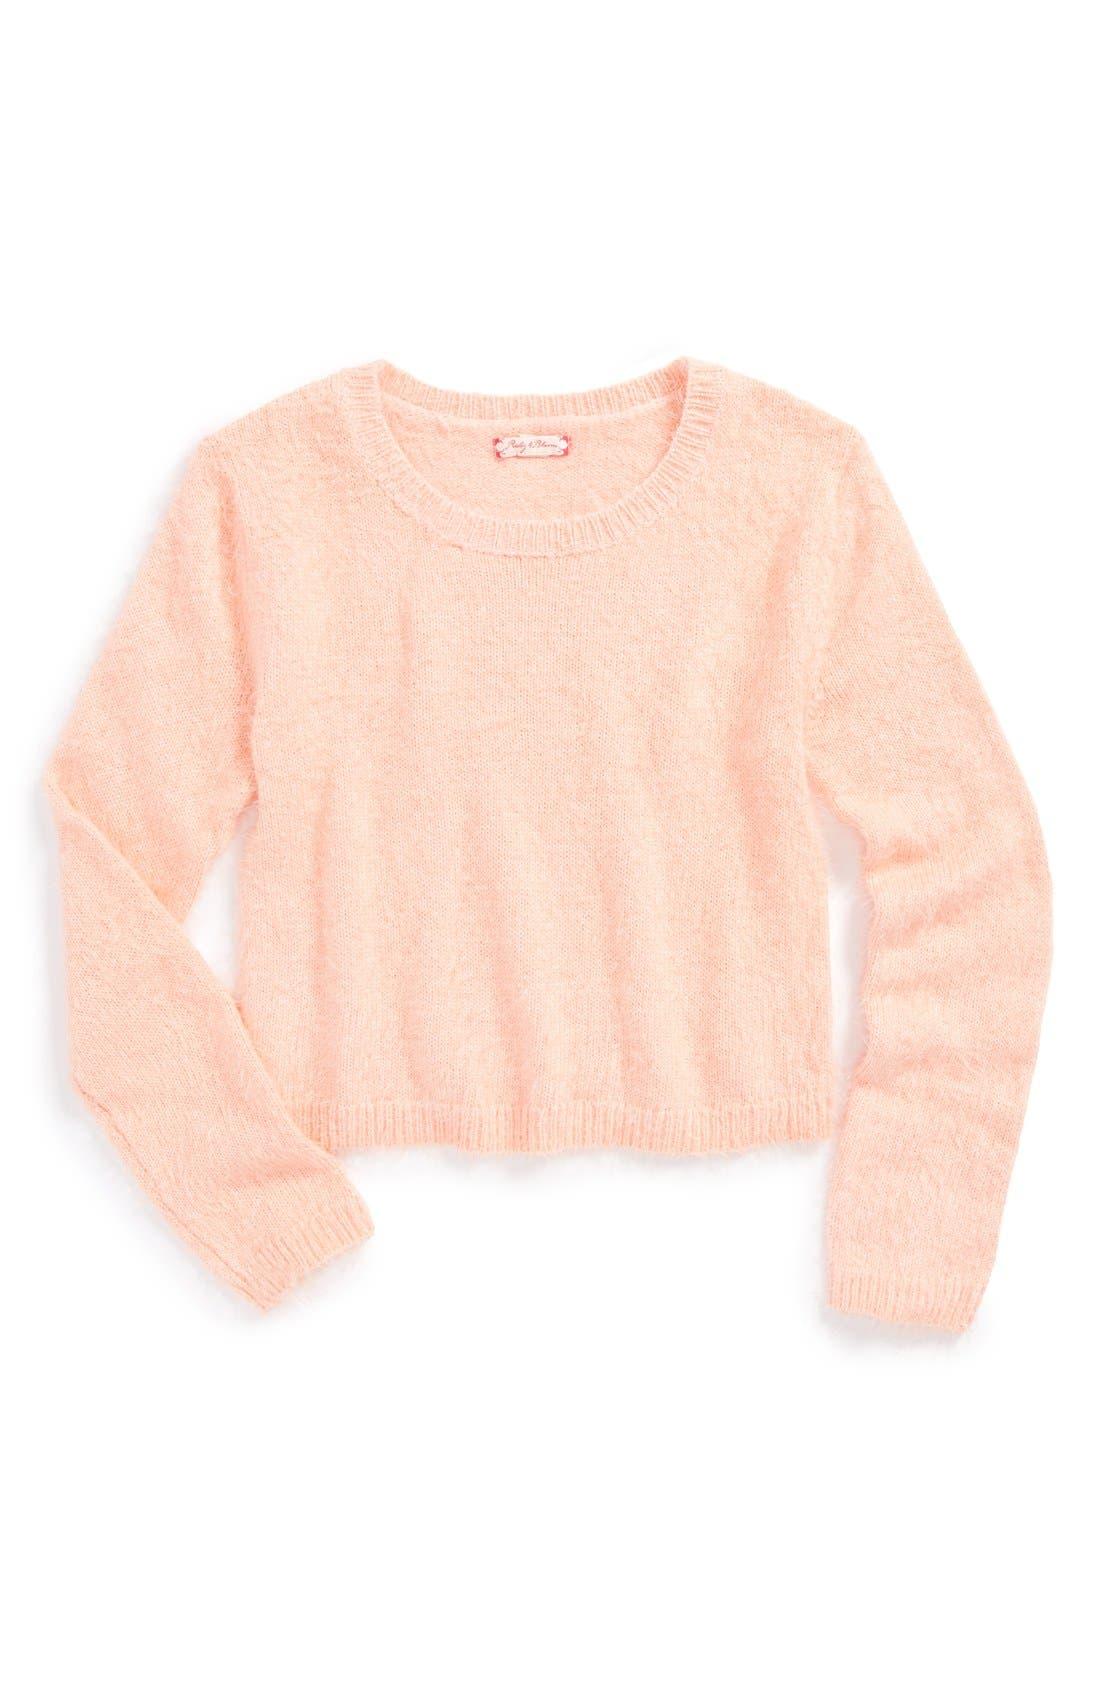 Alternate Image 1 Selected - Ruby & Bloom 'Jetee' Sweater (Little Girls & Big Girls)